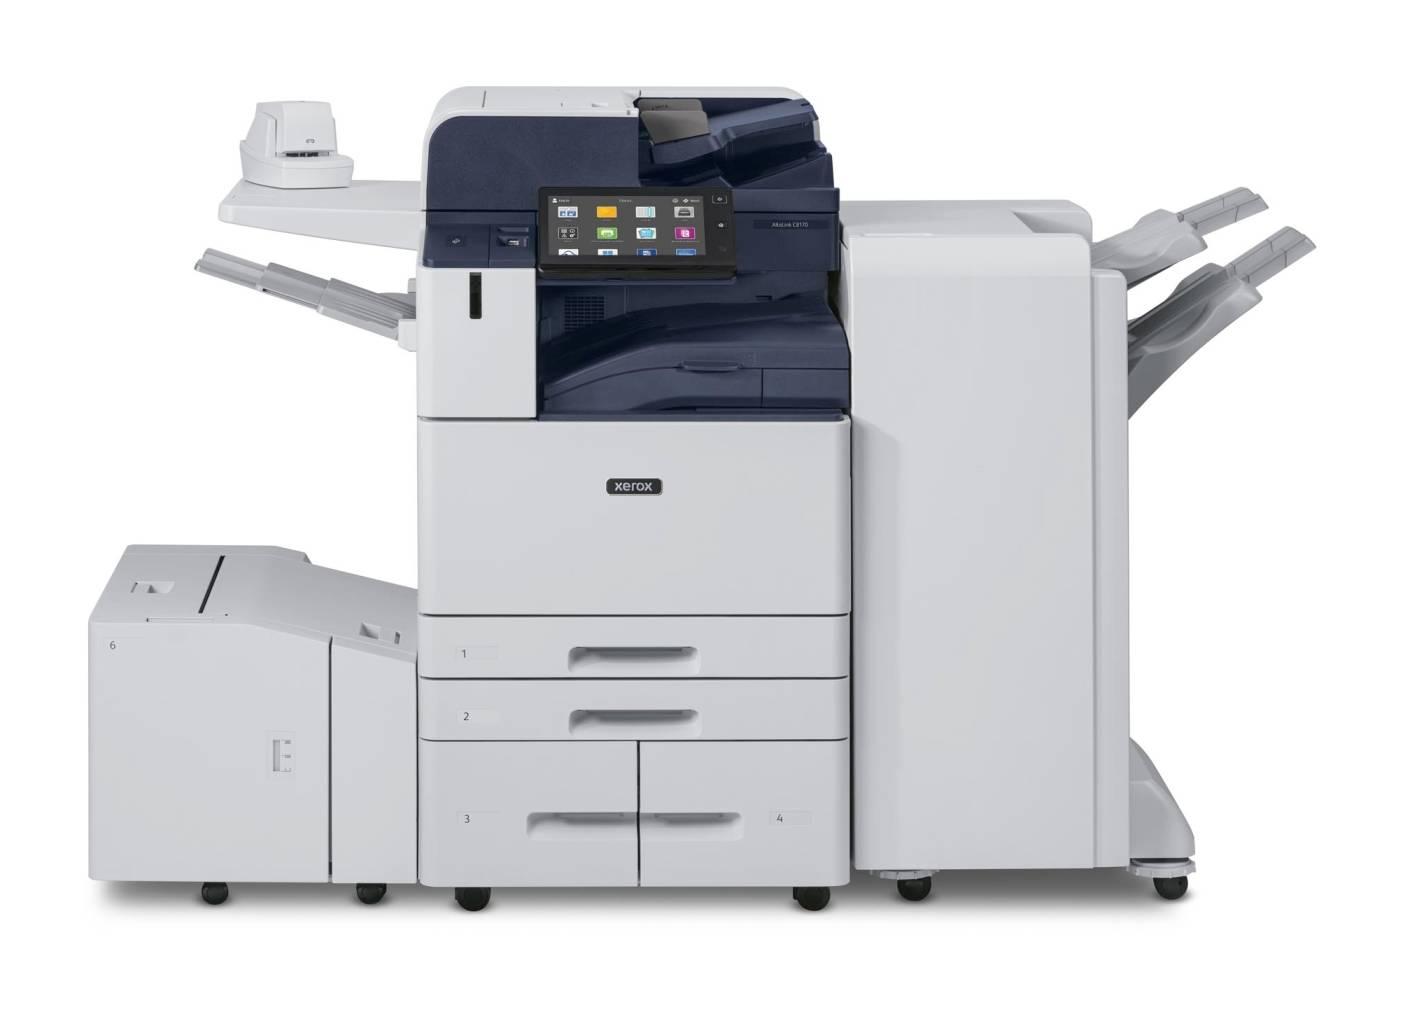 Impresora multifunción Xerox AltaLink C8155